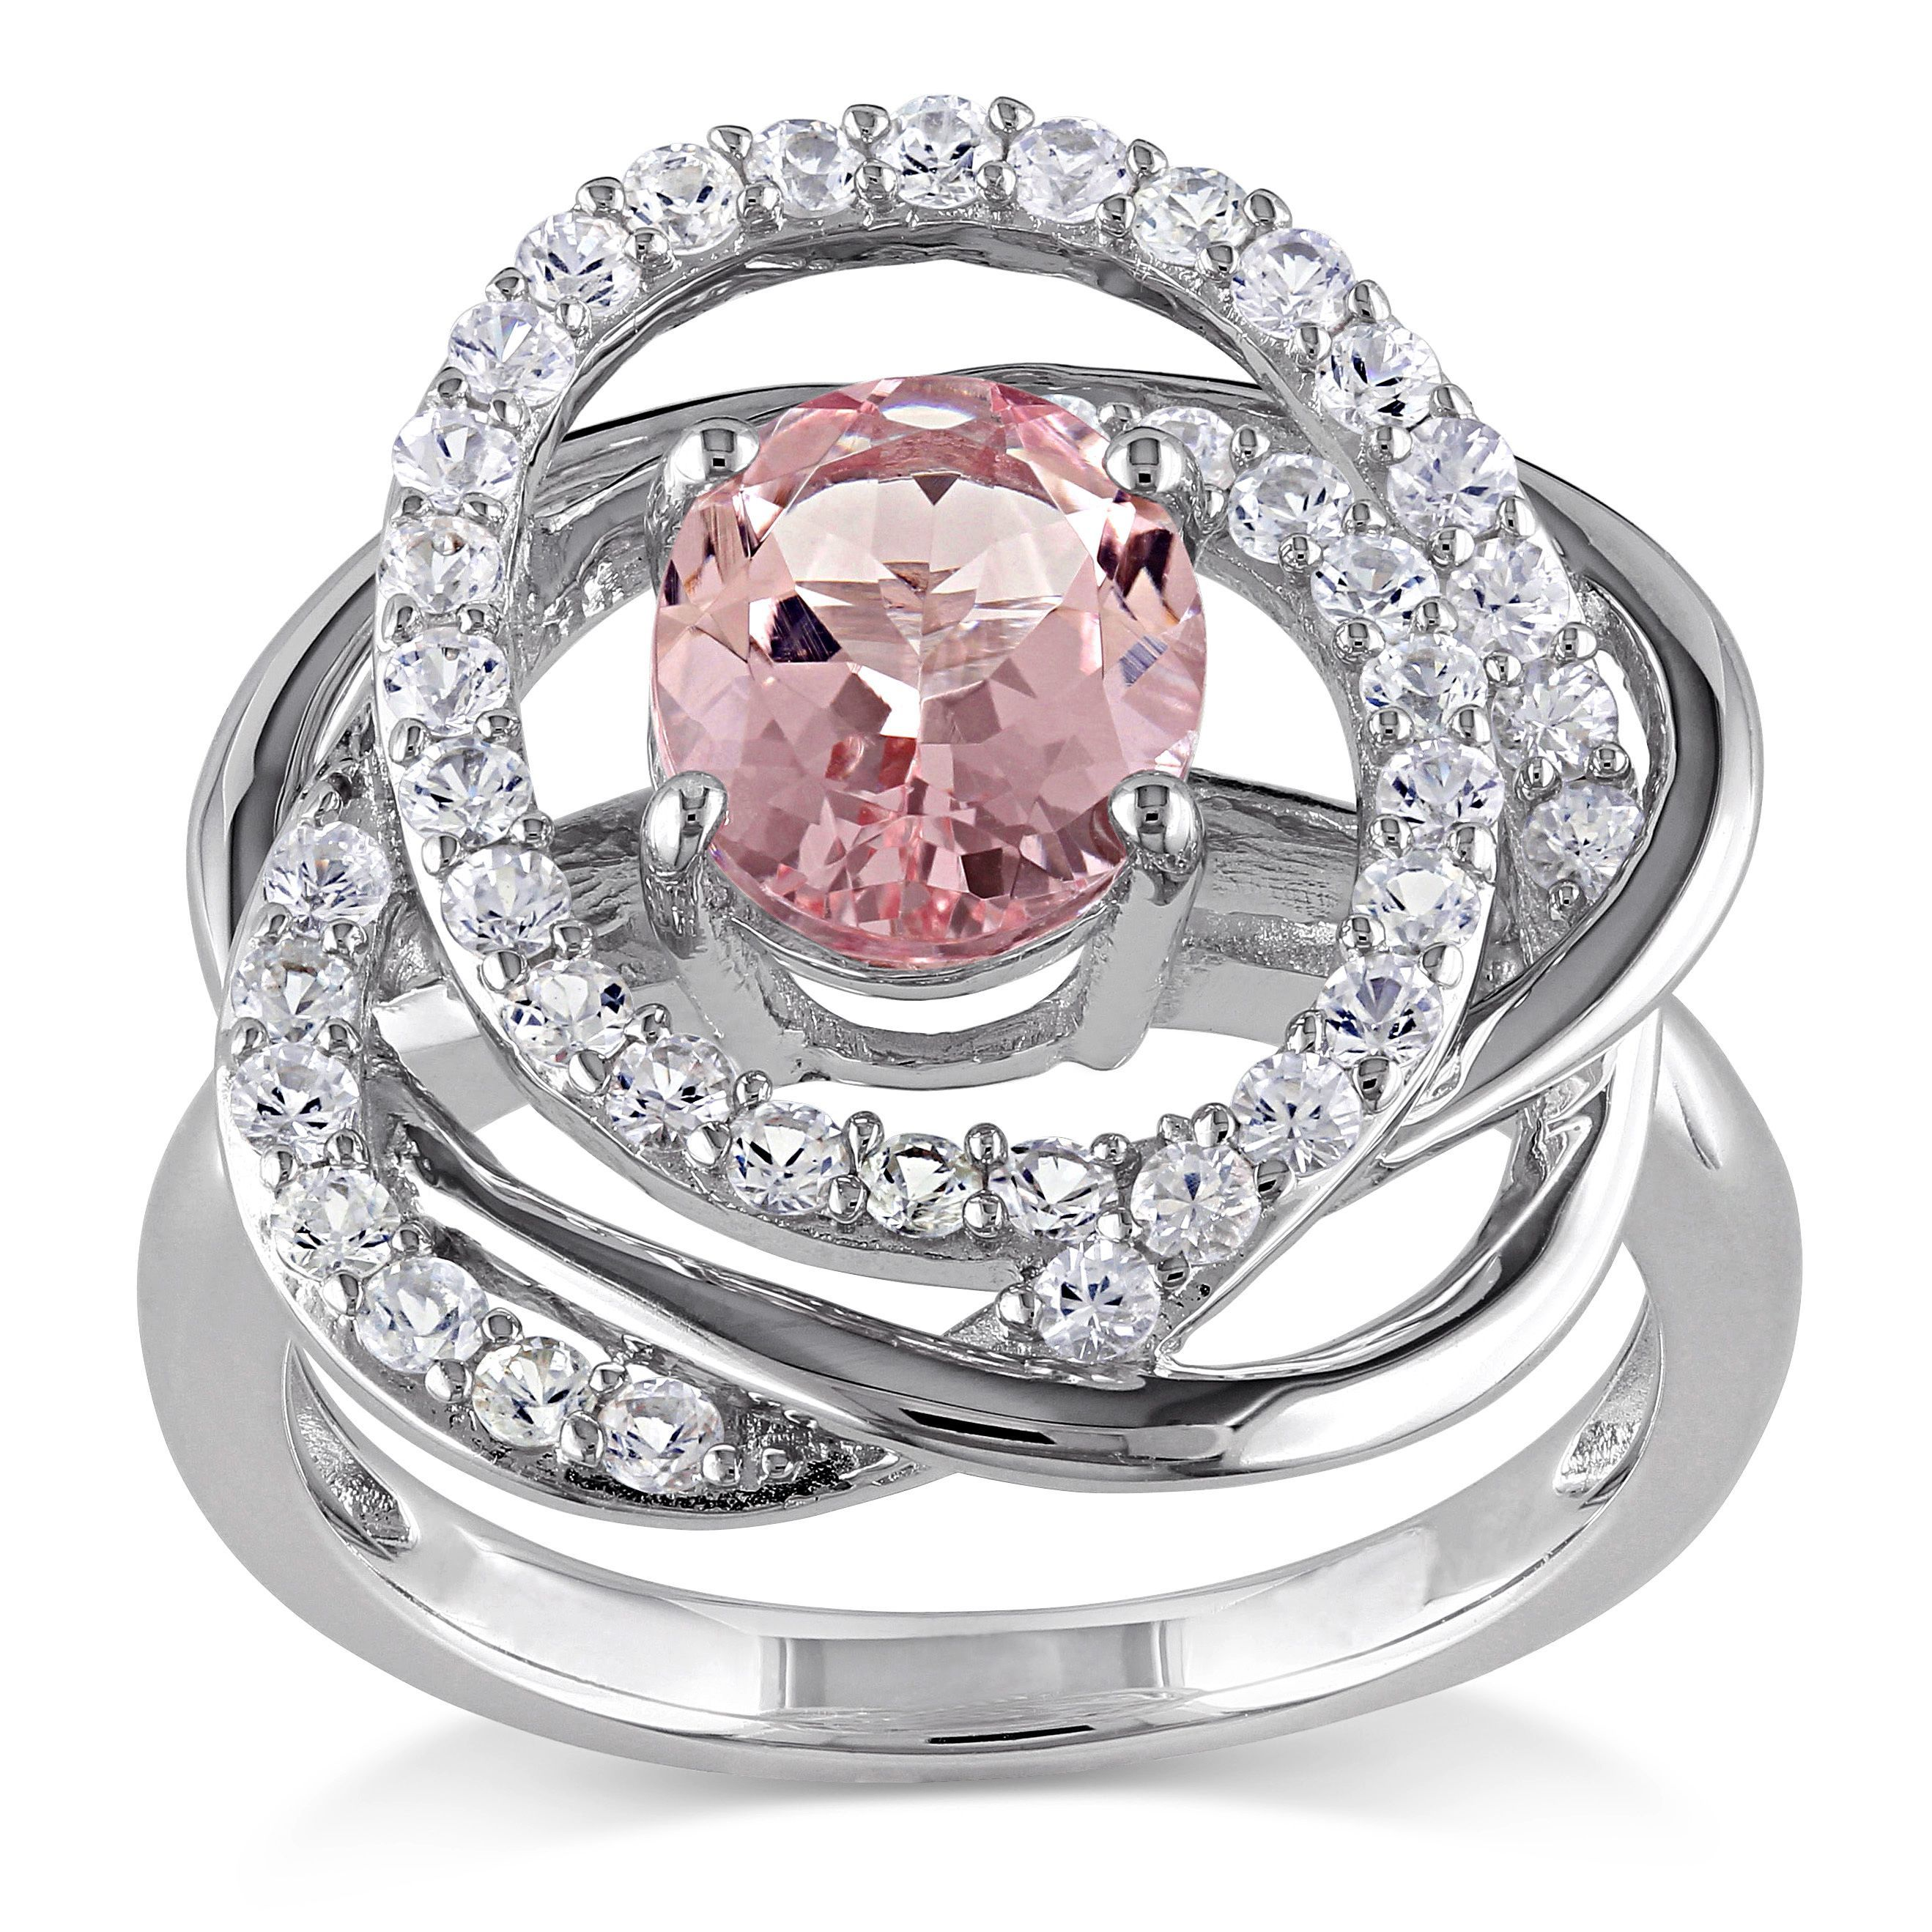 <li>Oval-cut morganite and round-cut white sapphires flower ring</li><li>Sterling silver jewelry</li><li><a><a href='http://www.overstock.com/downloads/pdf/2010_RingSizing.pdf'><span class='links'>Click here for ring sizing guide</span></a></li>